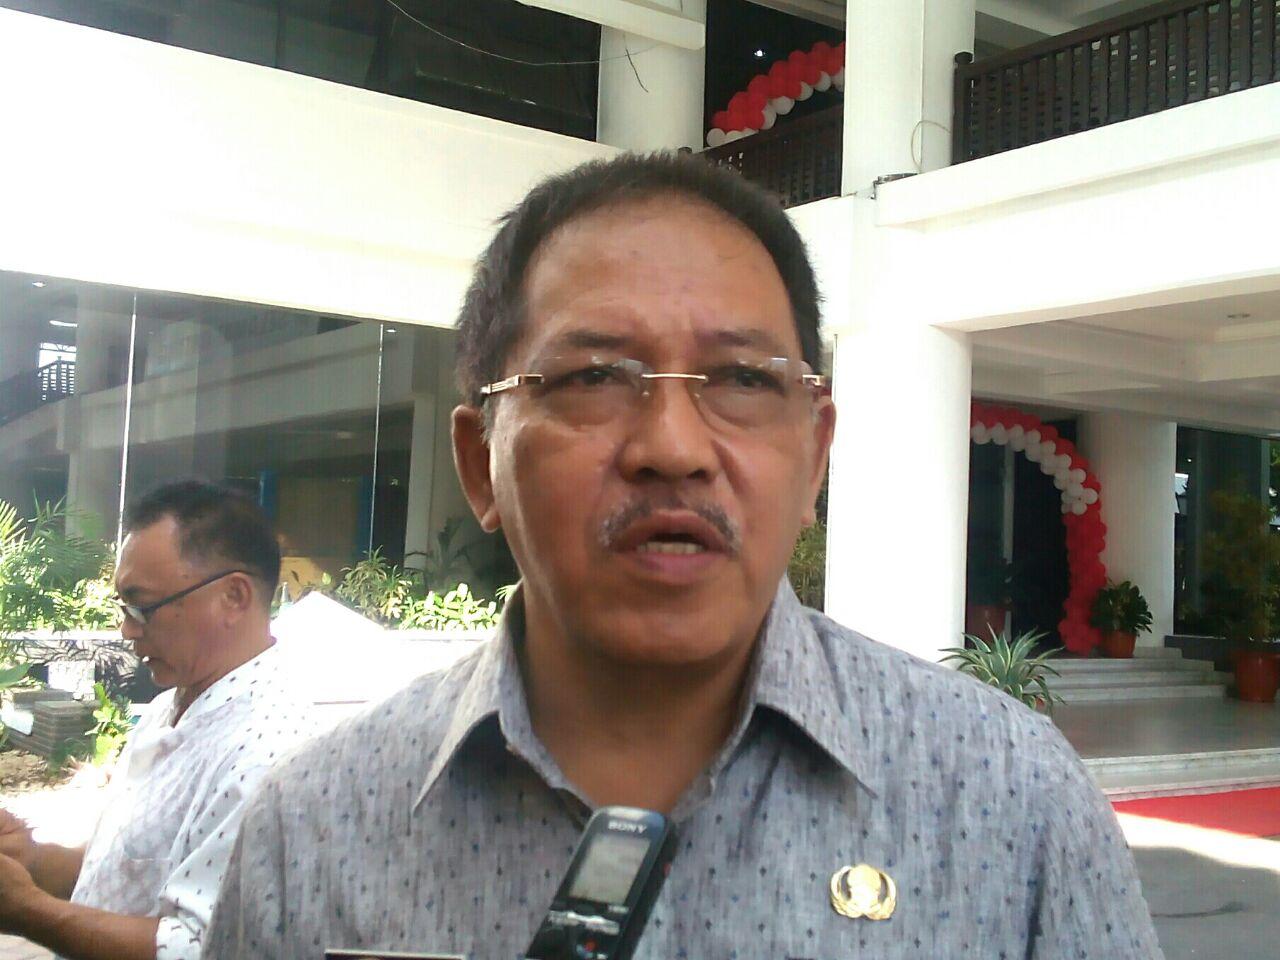 Kunjungi Lokasi Wisata Sulut, Menteri LHK Ajak Pelaku Usaha Harus Memiliki Izin